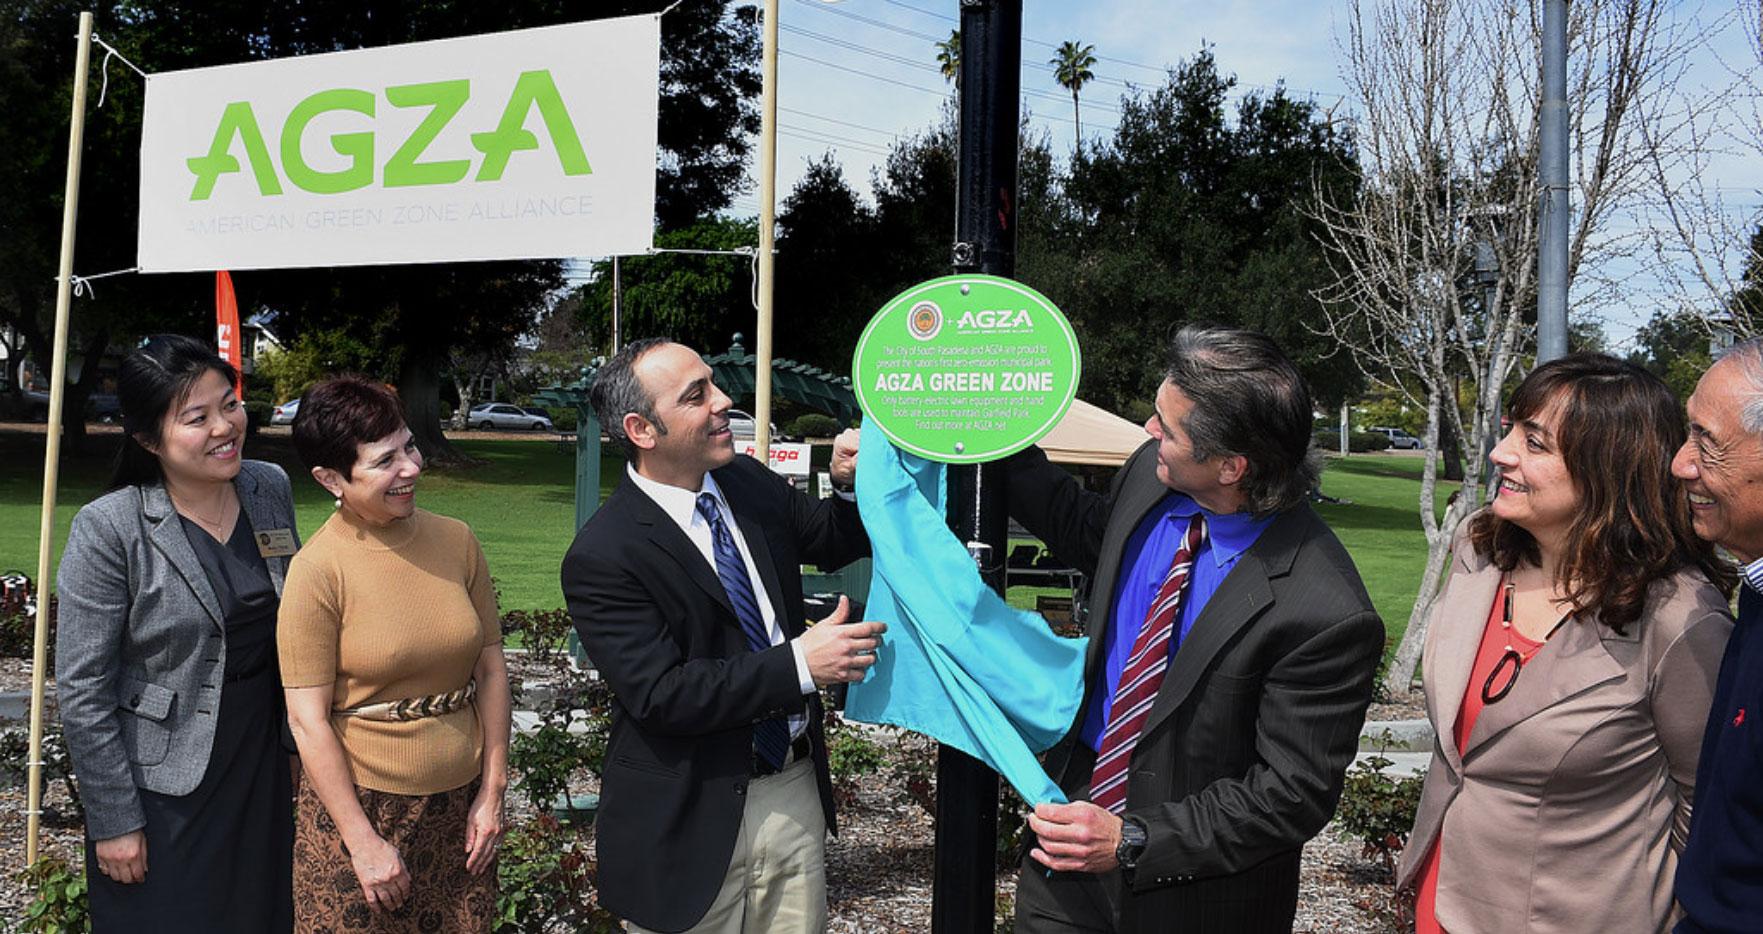 AGZA_media_photos_Pasadena_Star_News_01.jpg